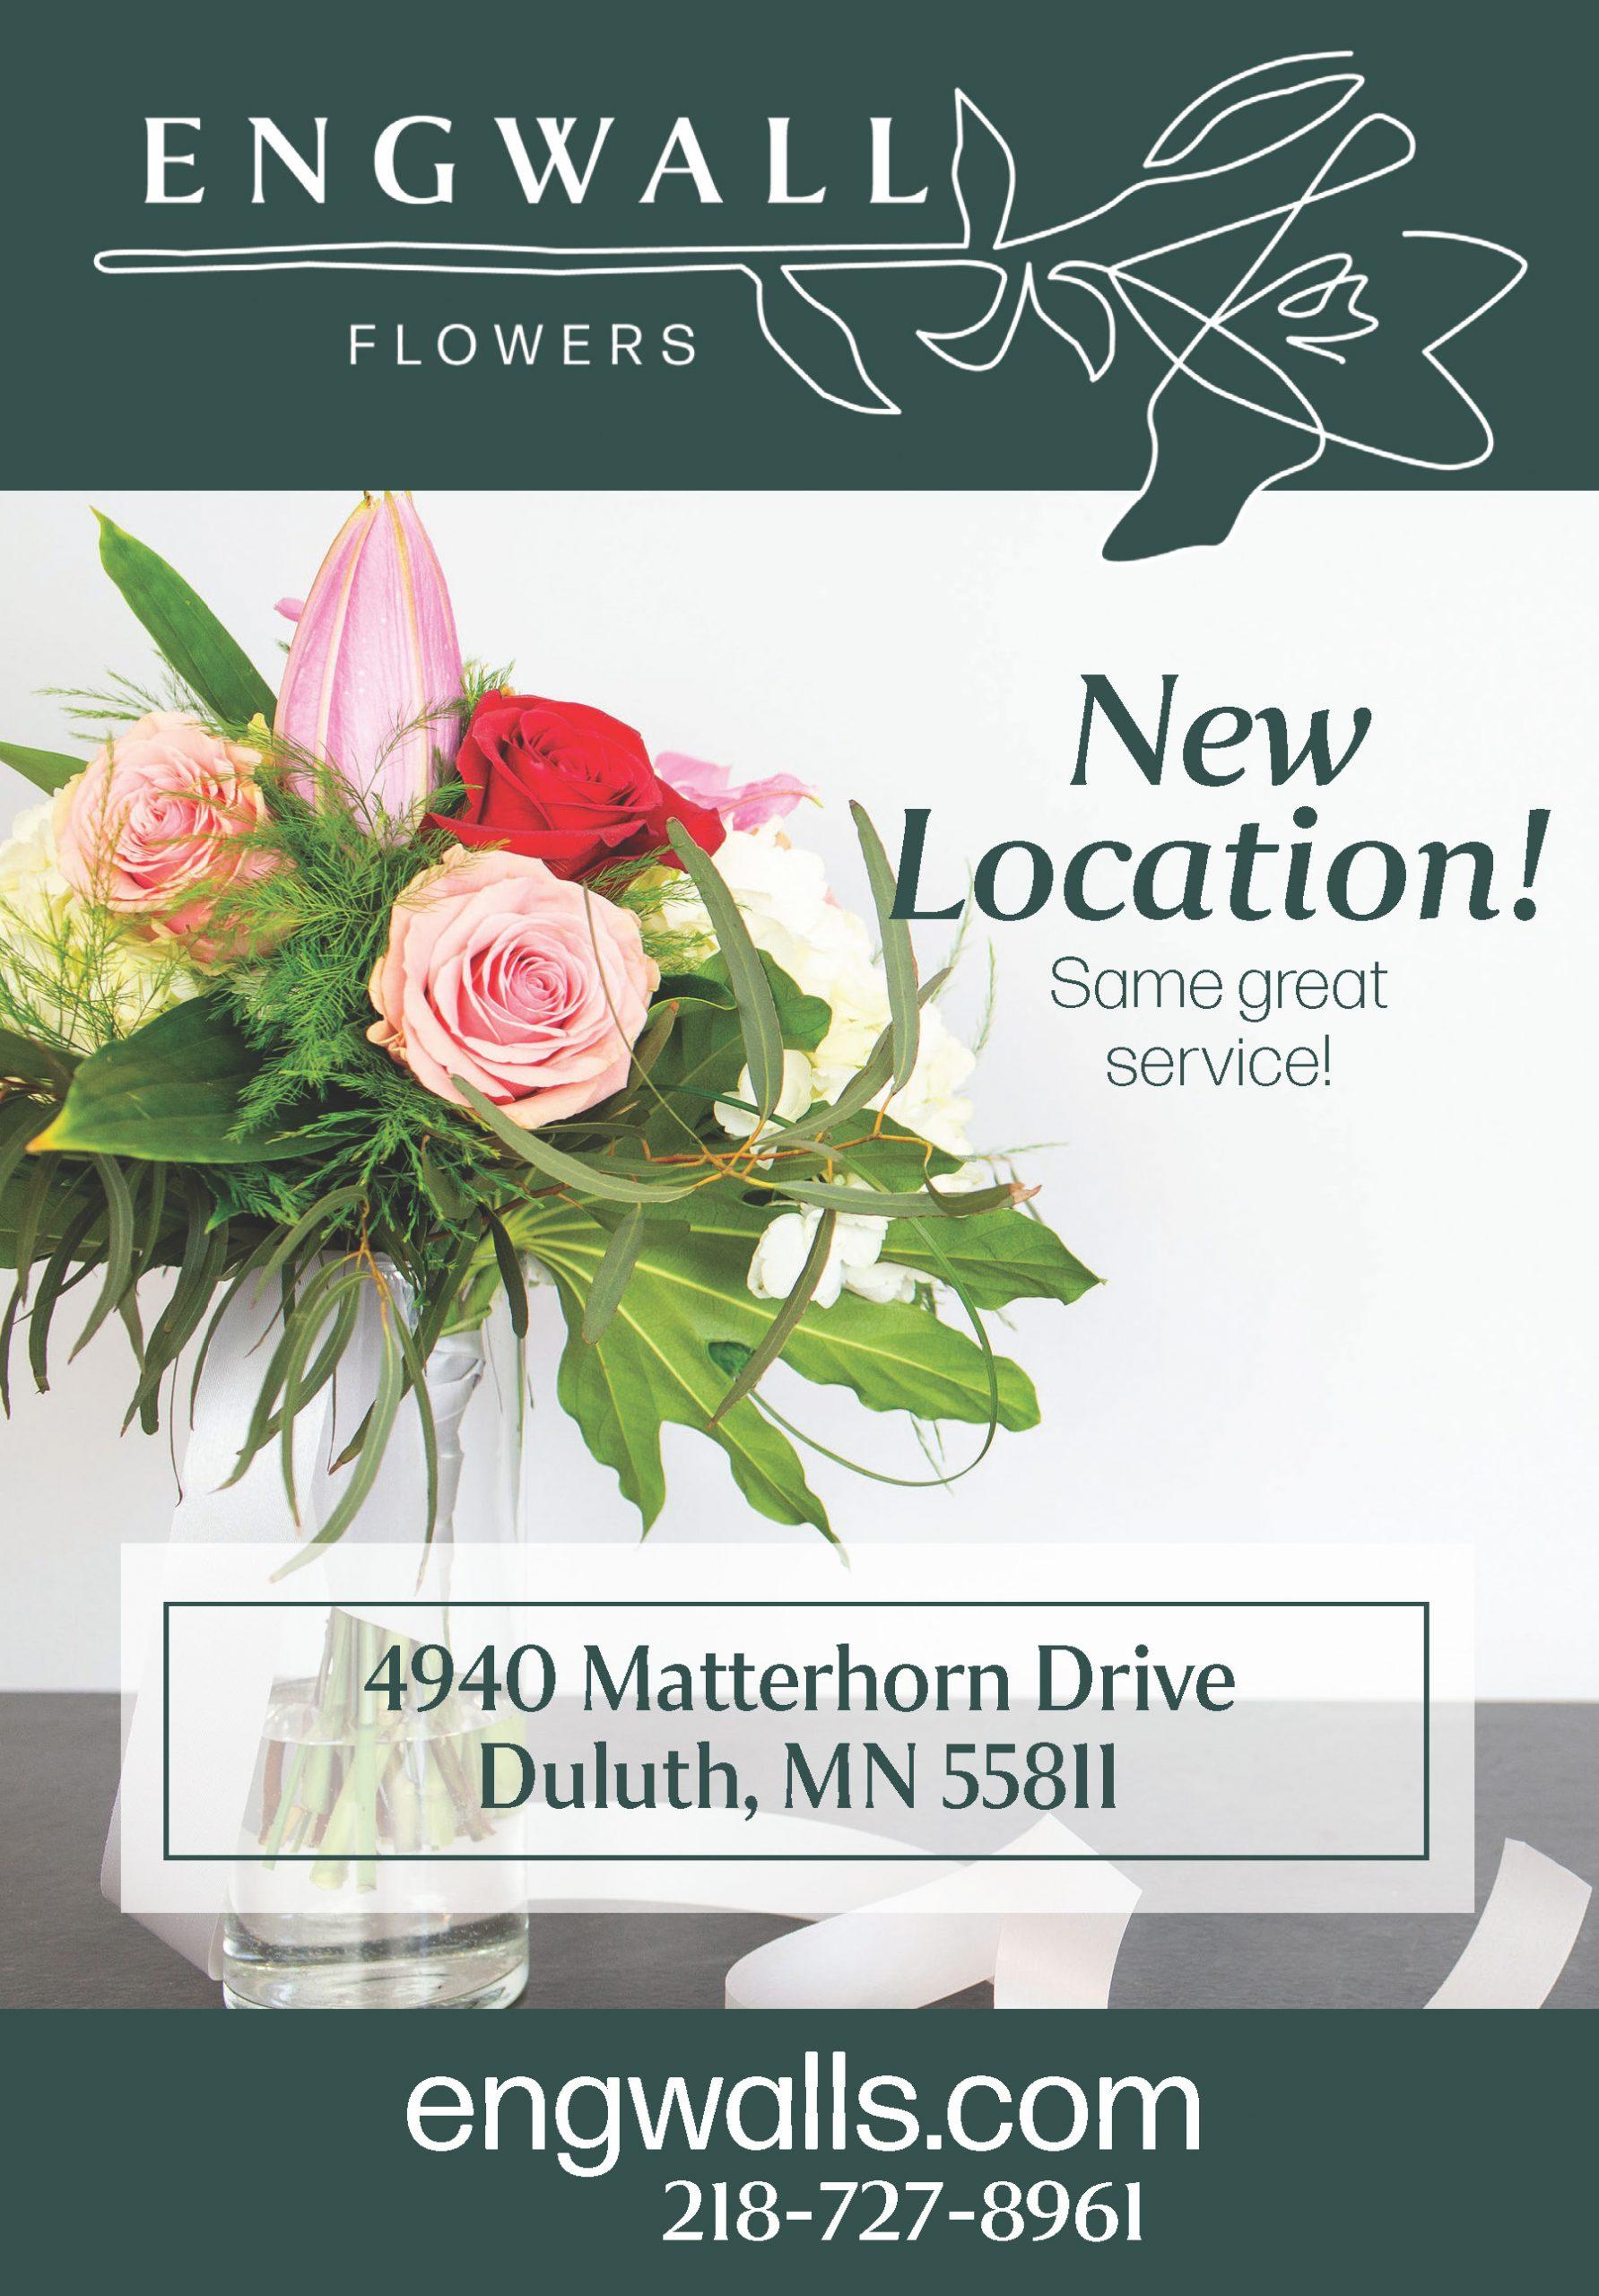 Engwall Flowers Newspaper Ad